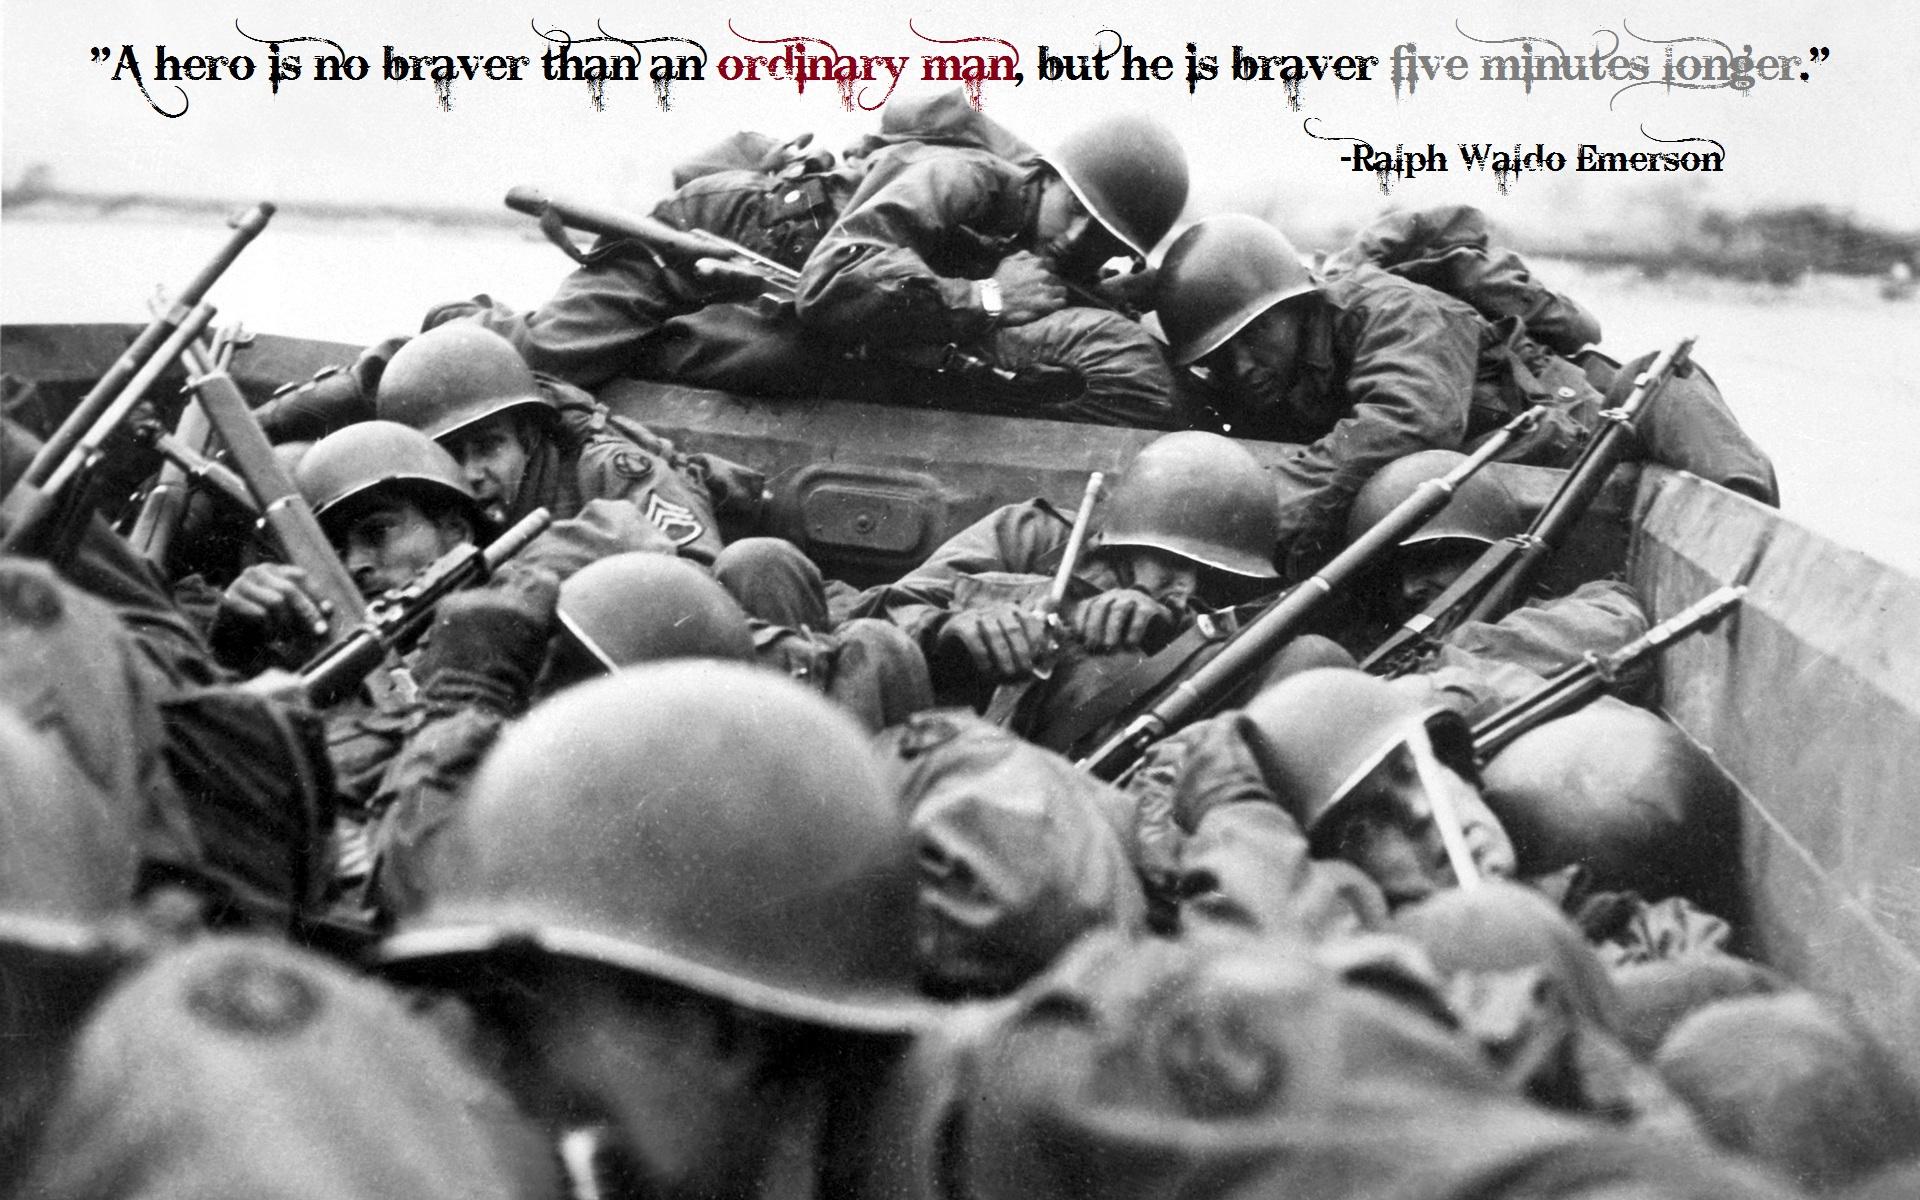 Ralph Waldo Emerson Hero Braver BW Soldiers WWII World War ...